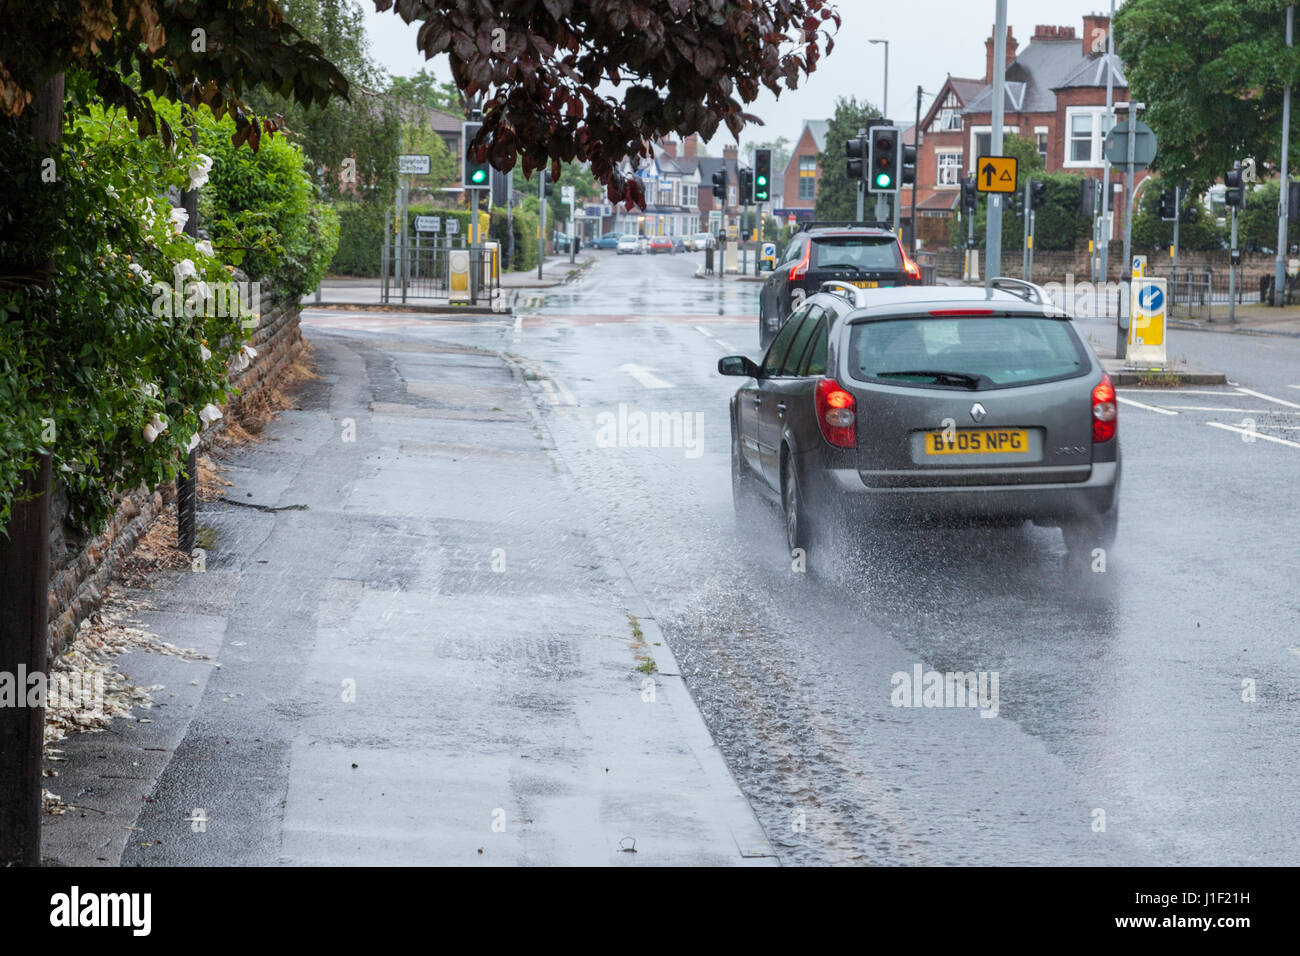 Traffic in bad weather, Nottinghamshire, England, UK - Stock Image